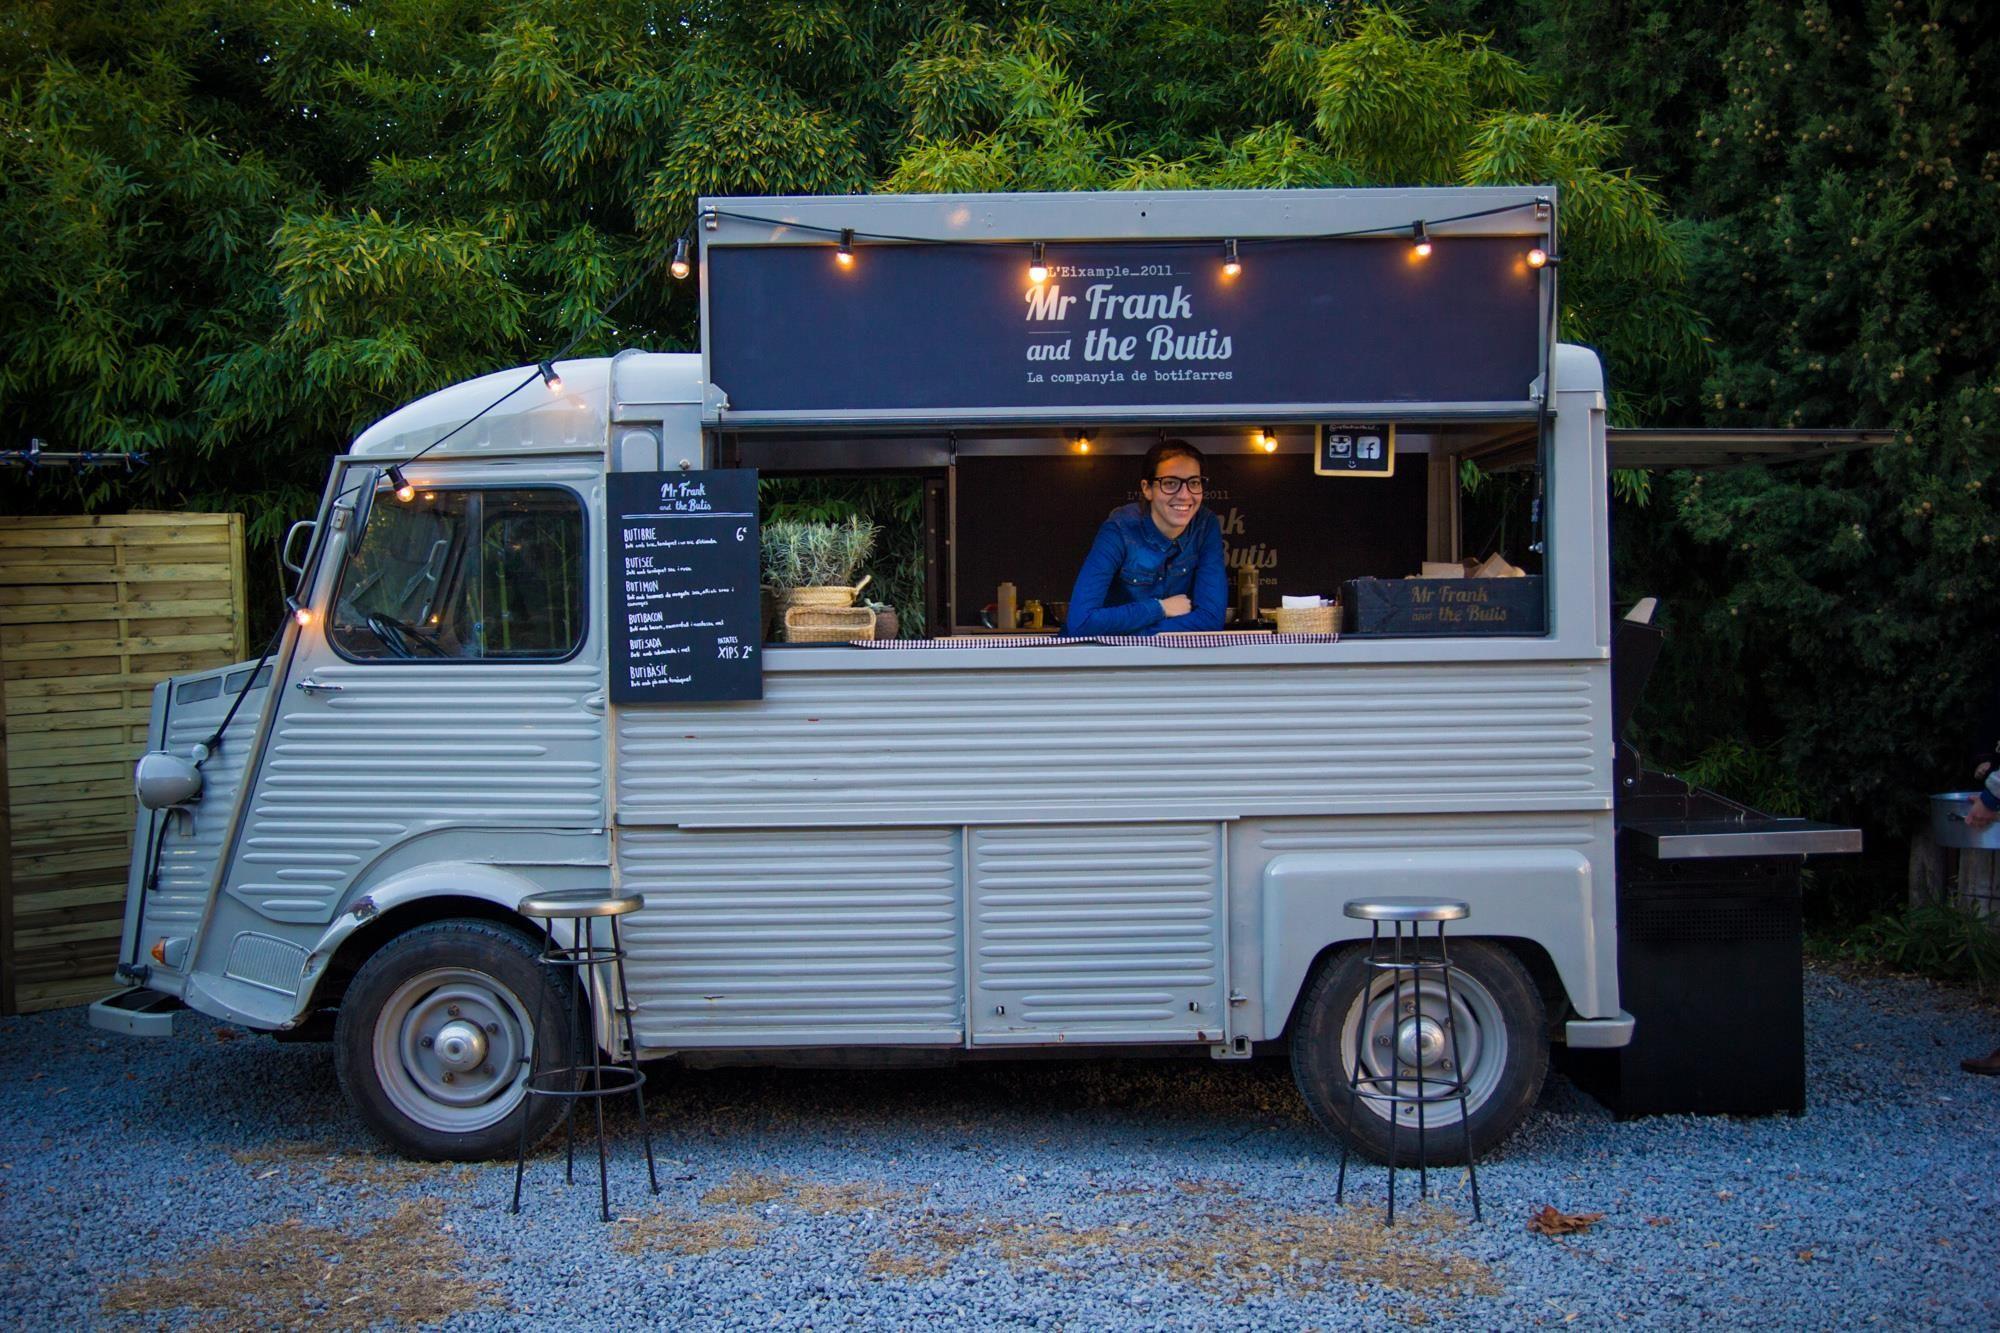 craigslist arizona food trucks for sale by owner